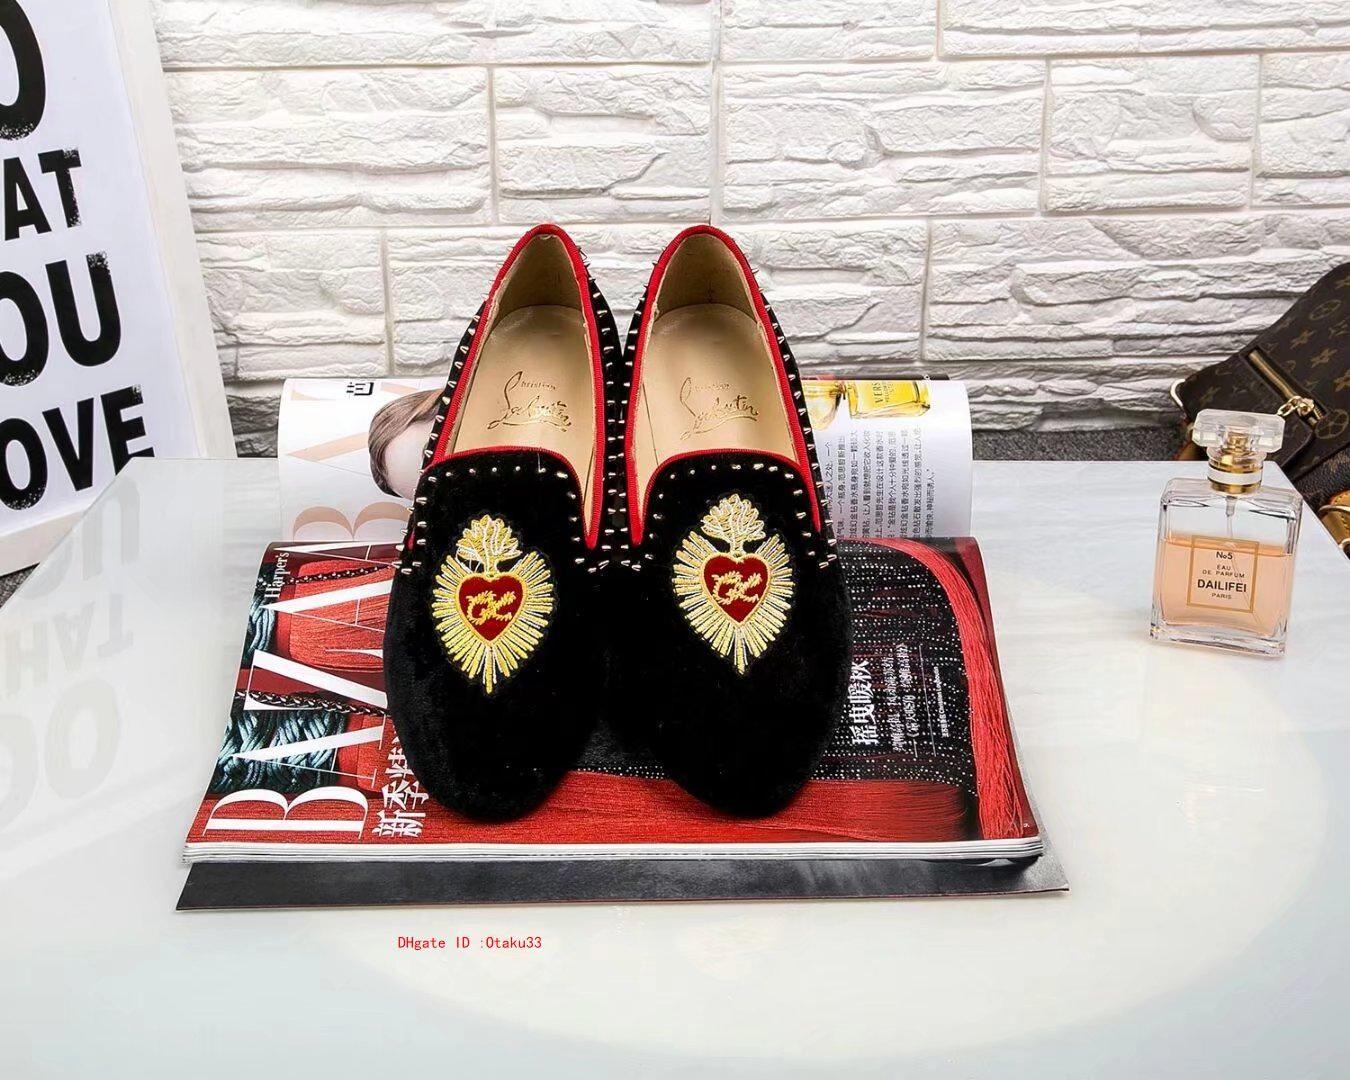 Alargar Flats sapatos de mulher 2019 Primavera Loafer Moda Patchwork Flats salto Ladies Shoe Casual rasas Mulheres s Shoes único para Mulheres